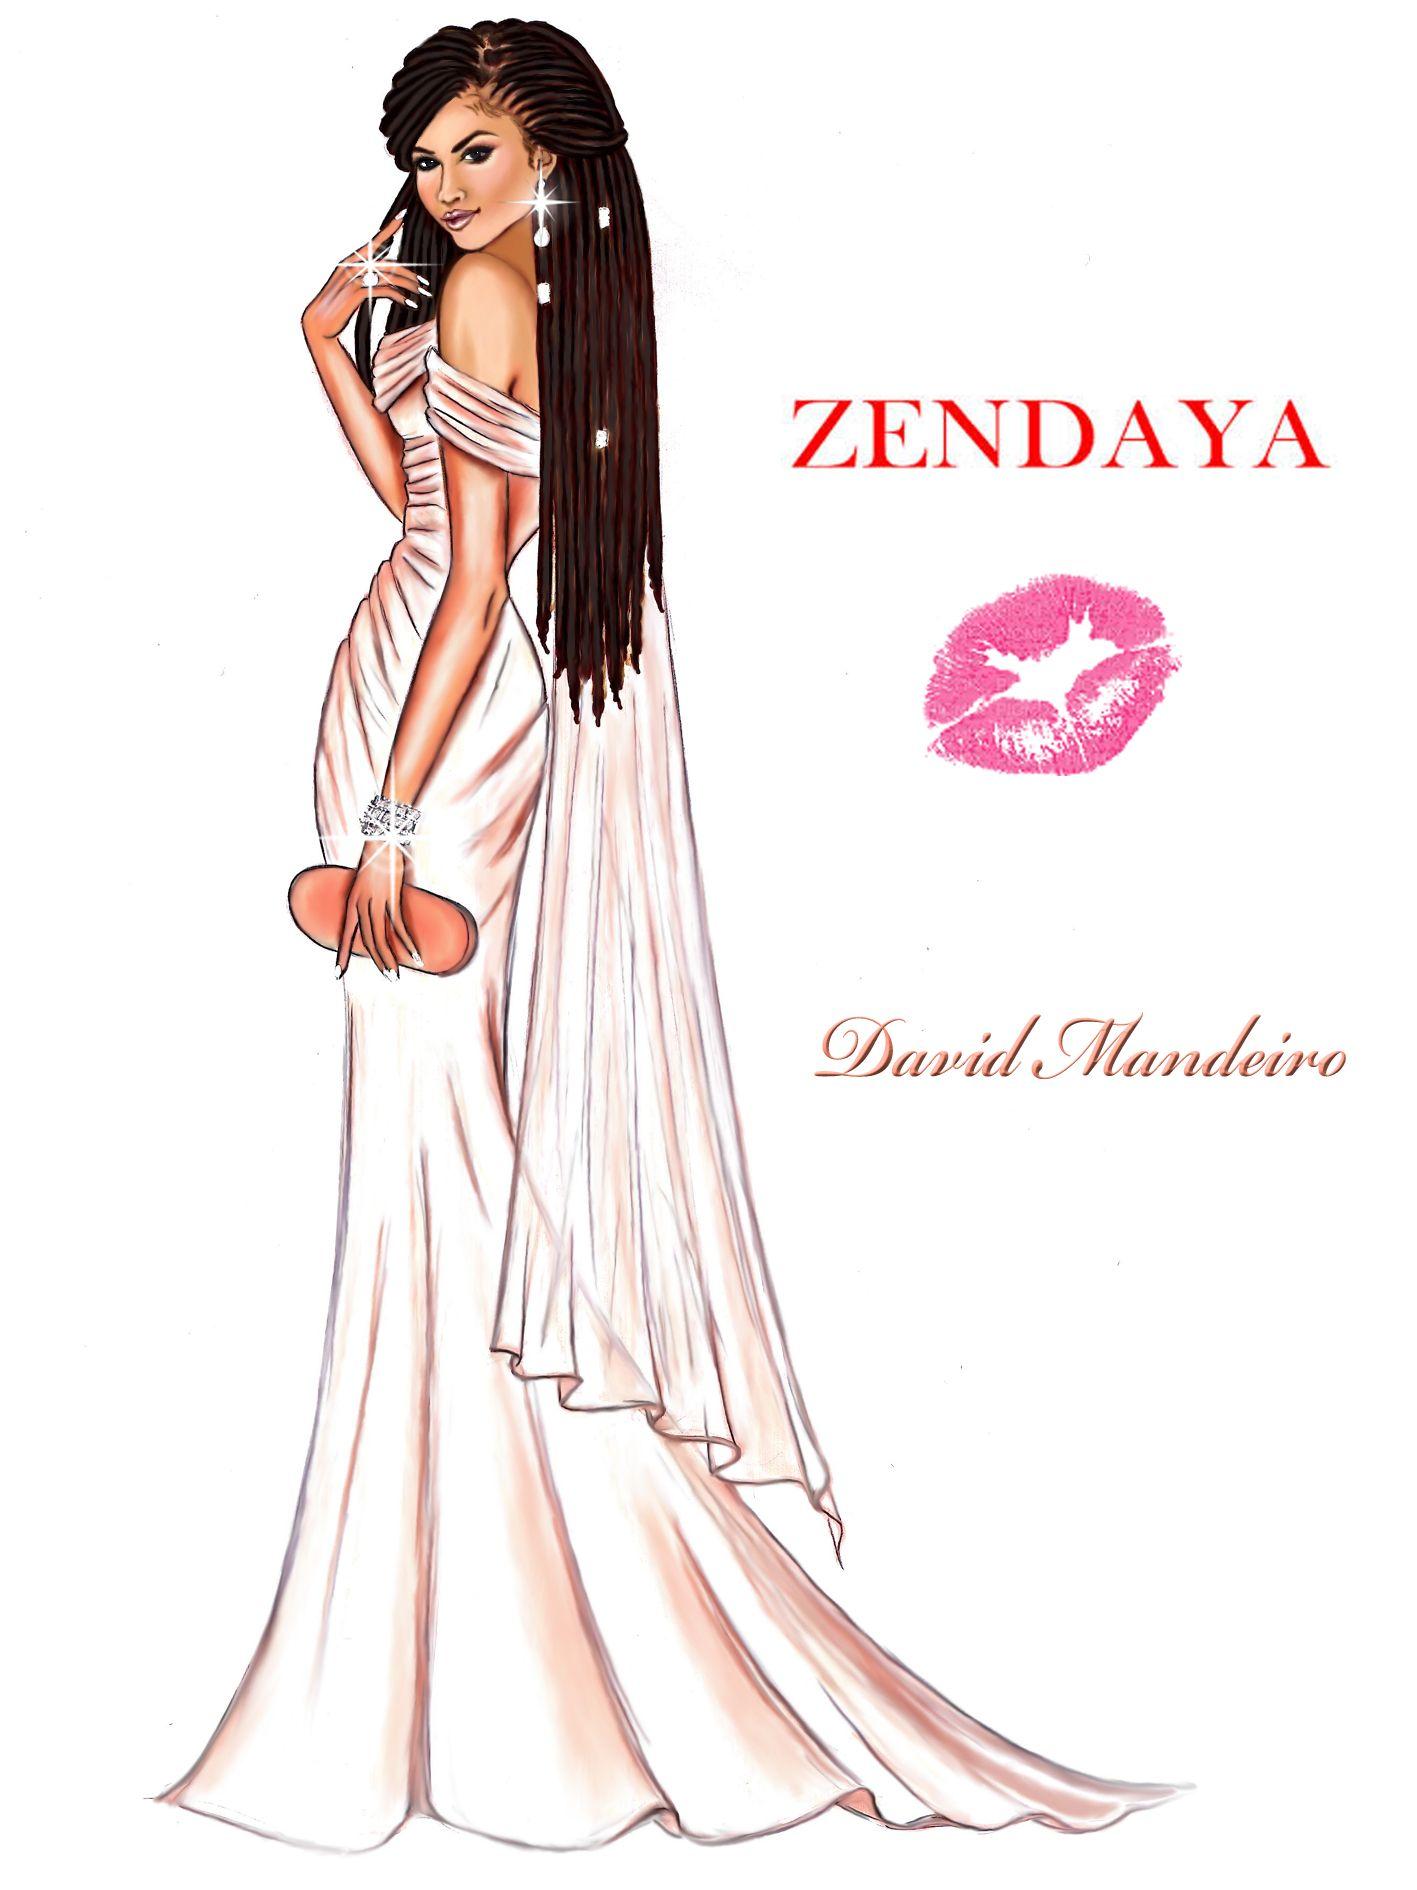 Zendaya in vivienne westwood at oscars 2015 by david mandeiro zendaya in vivienne westwood at oscars 2015 by david mandeiro sciox Choice Image